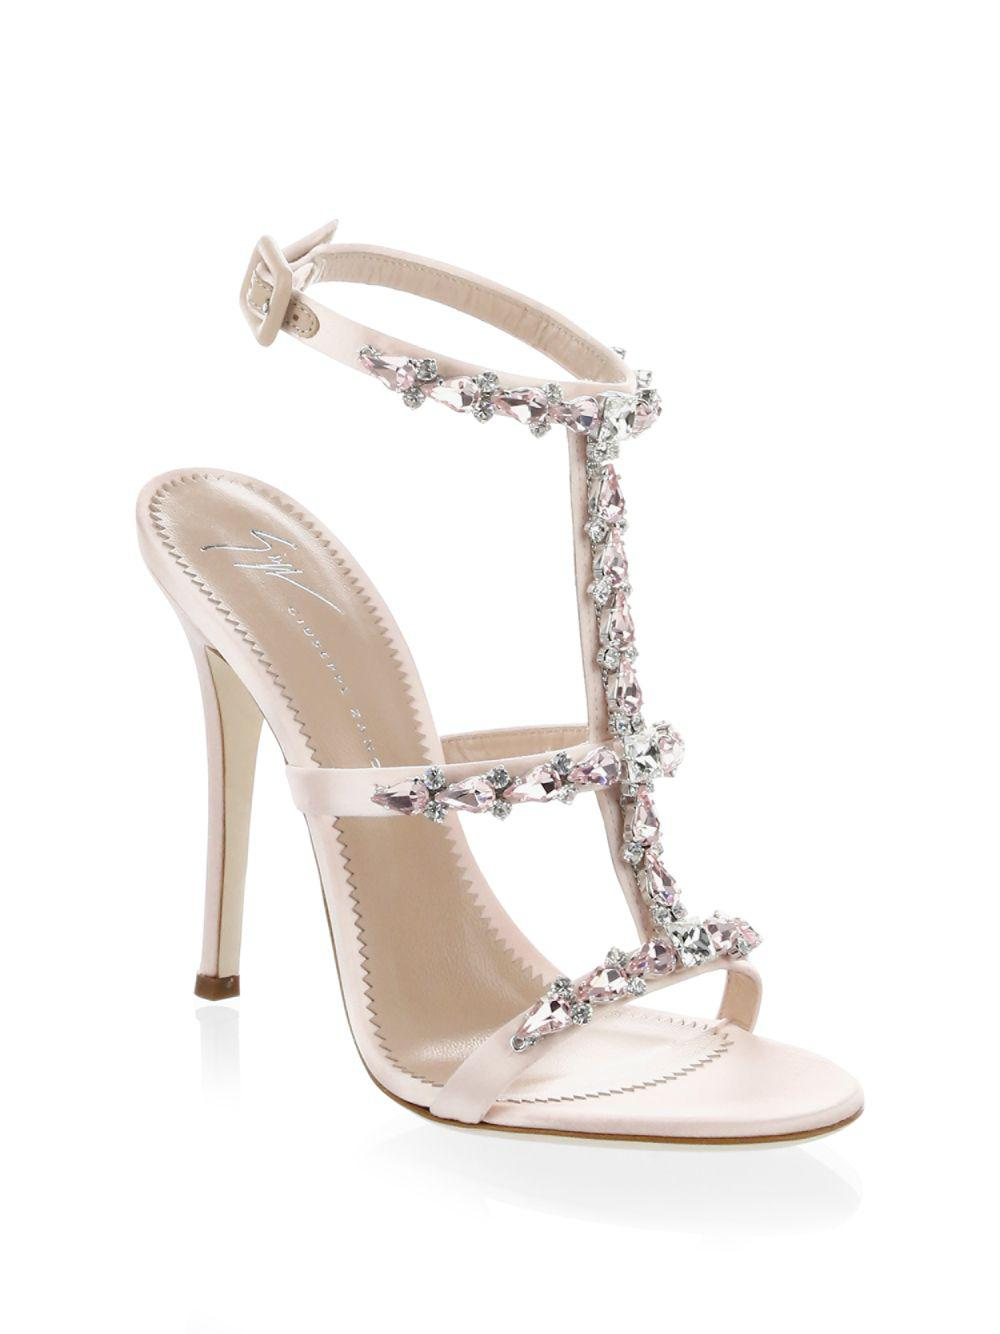 1b524a93c Lyst - Giuseppe Zanotti Alien Satin Open Toe Sandals in Pink - Save 6%